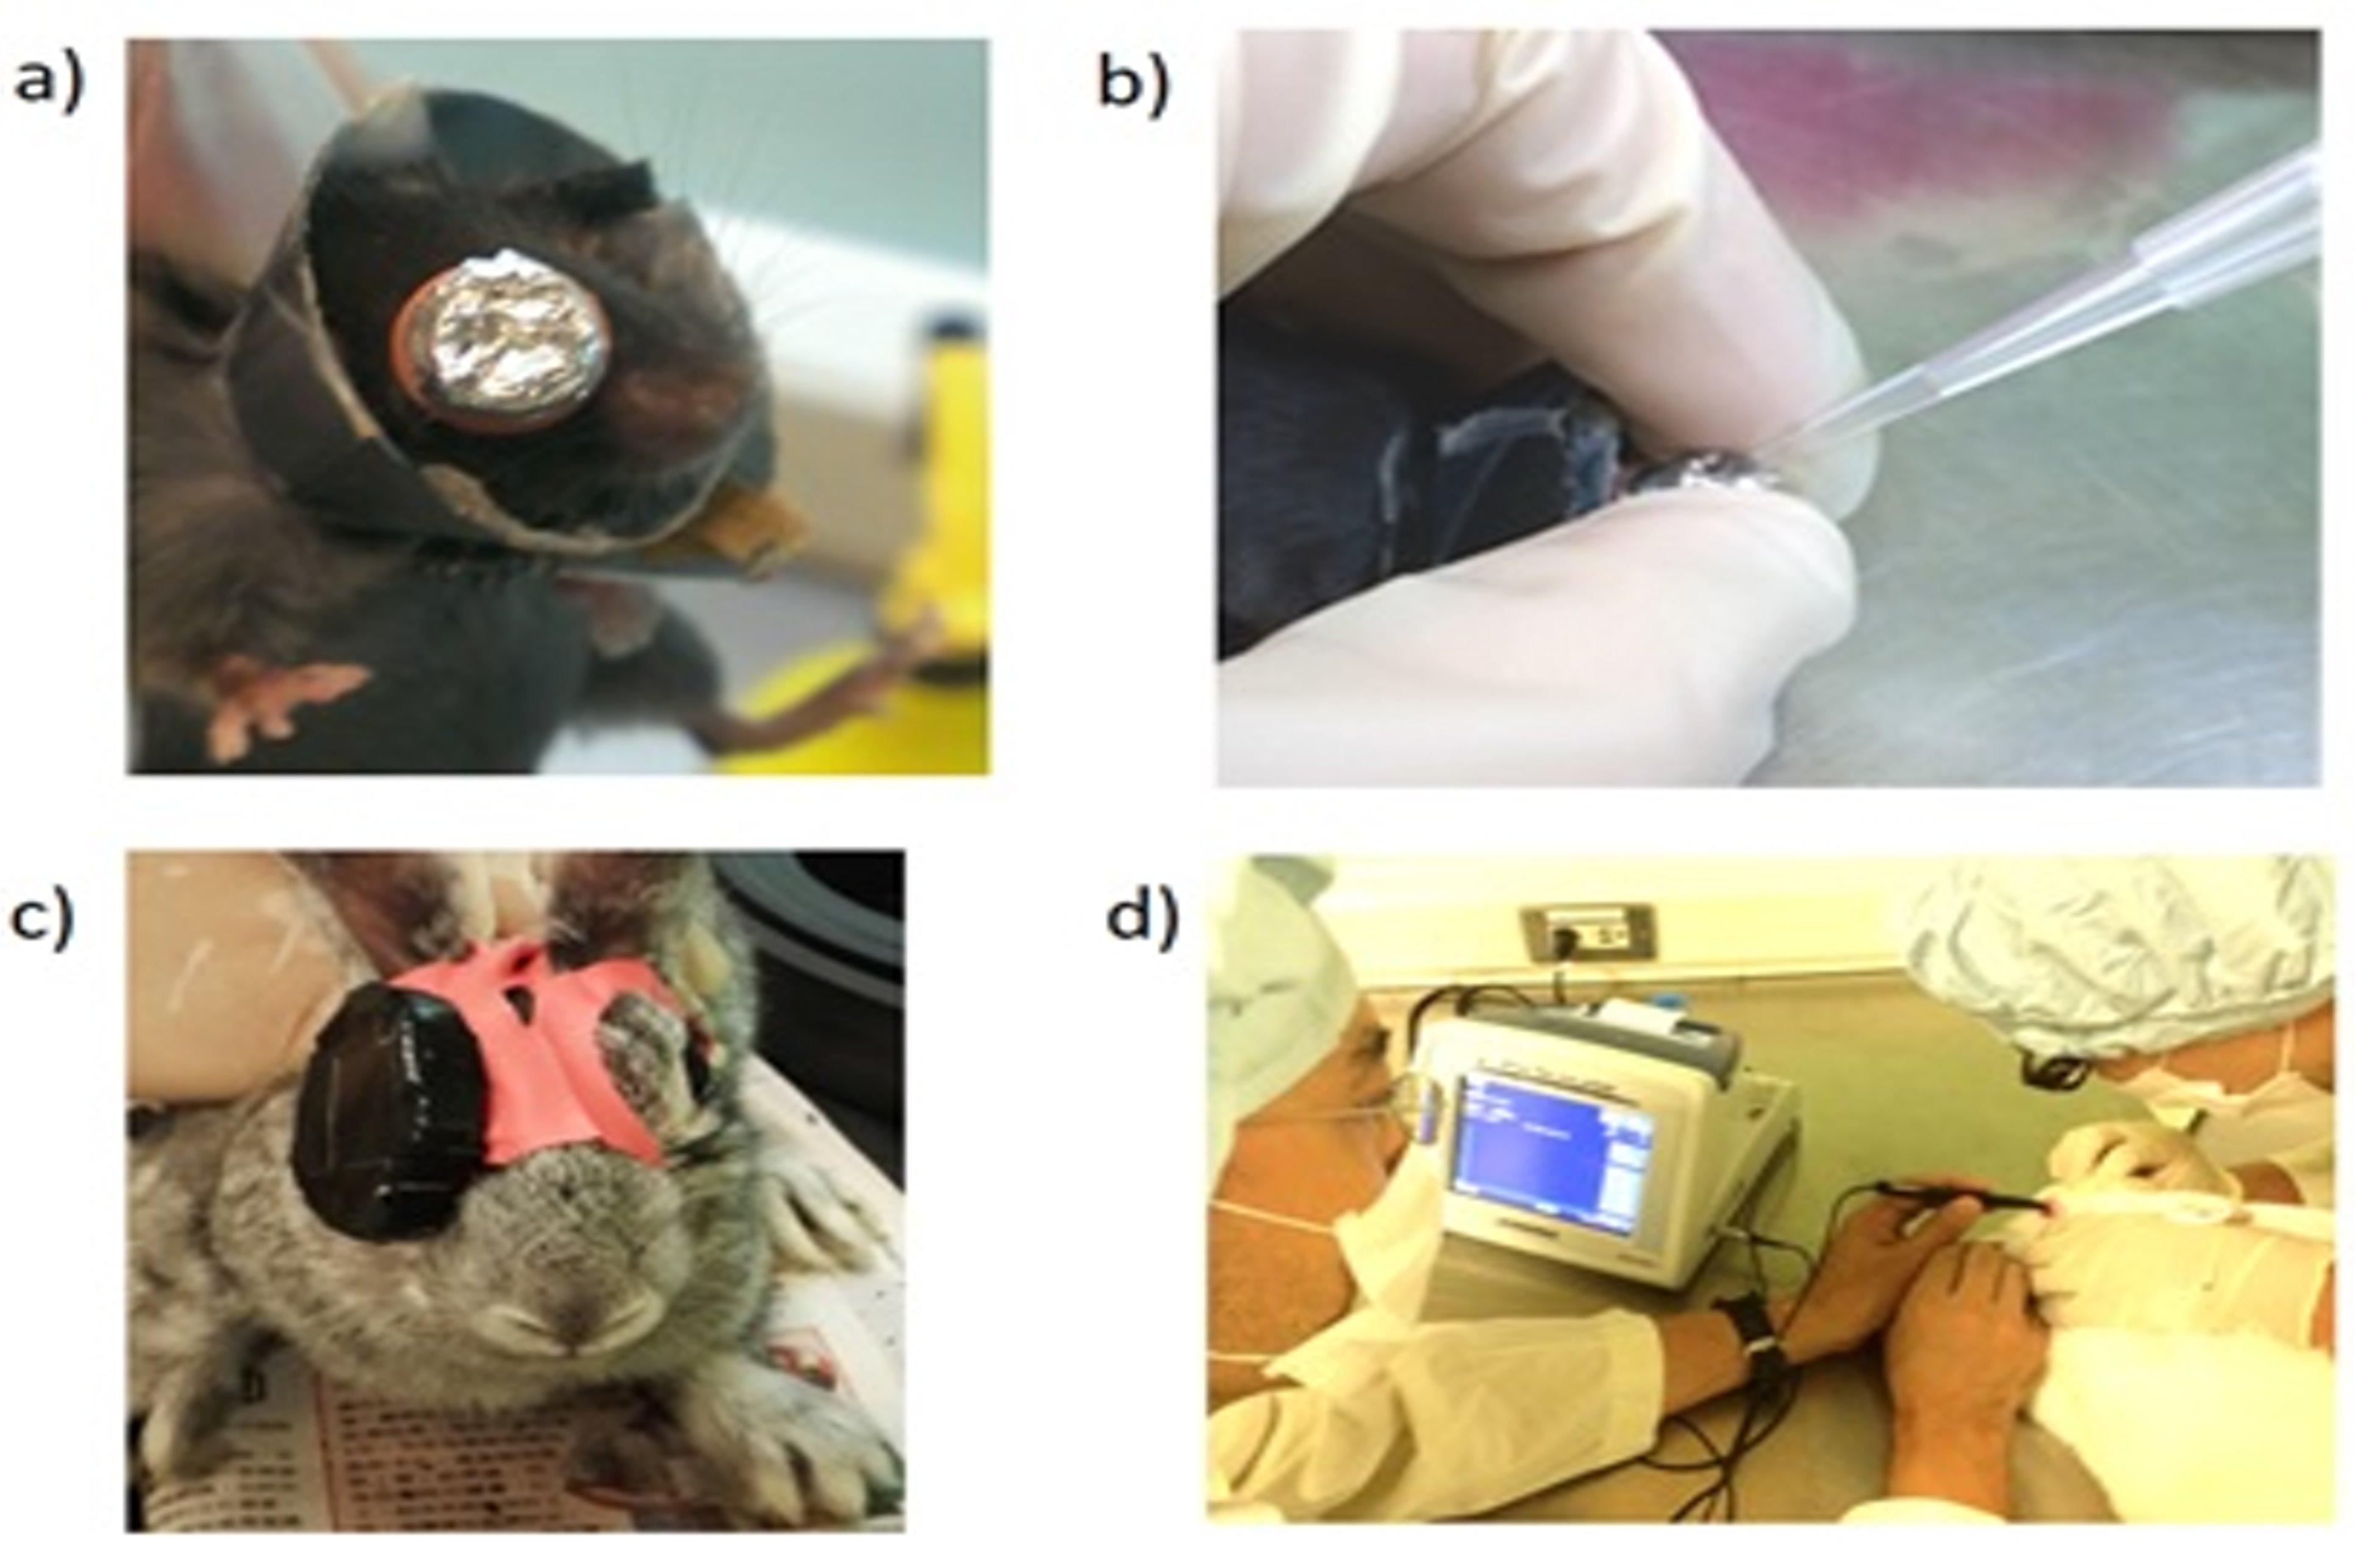 a)小鼠近視模型;b)剝開鋁箔紙給藥;c)兔子近視模型;d)以Ascan測量兔子眼軸長